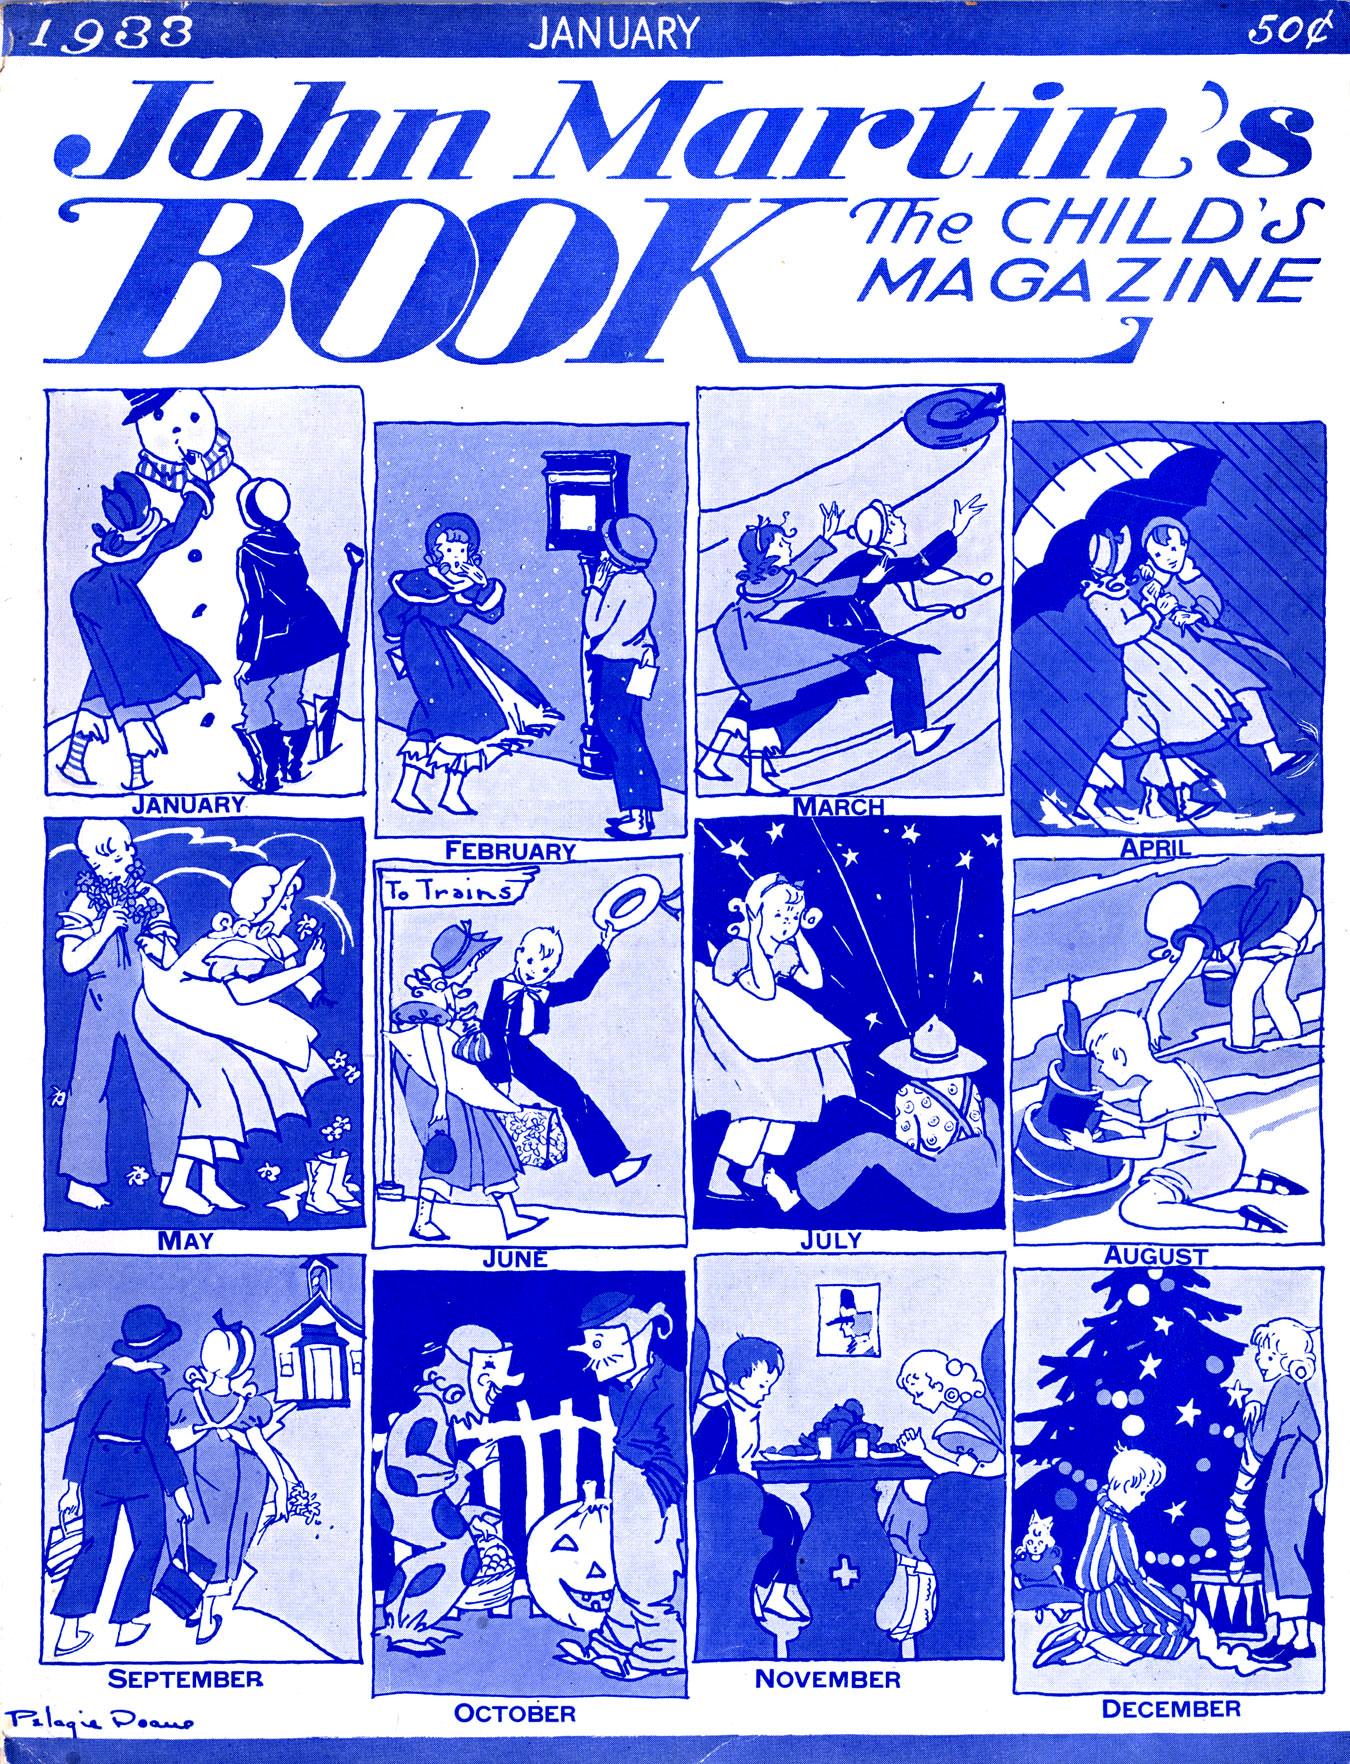 John-Martins-Book-Jan-1933